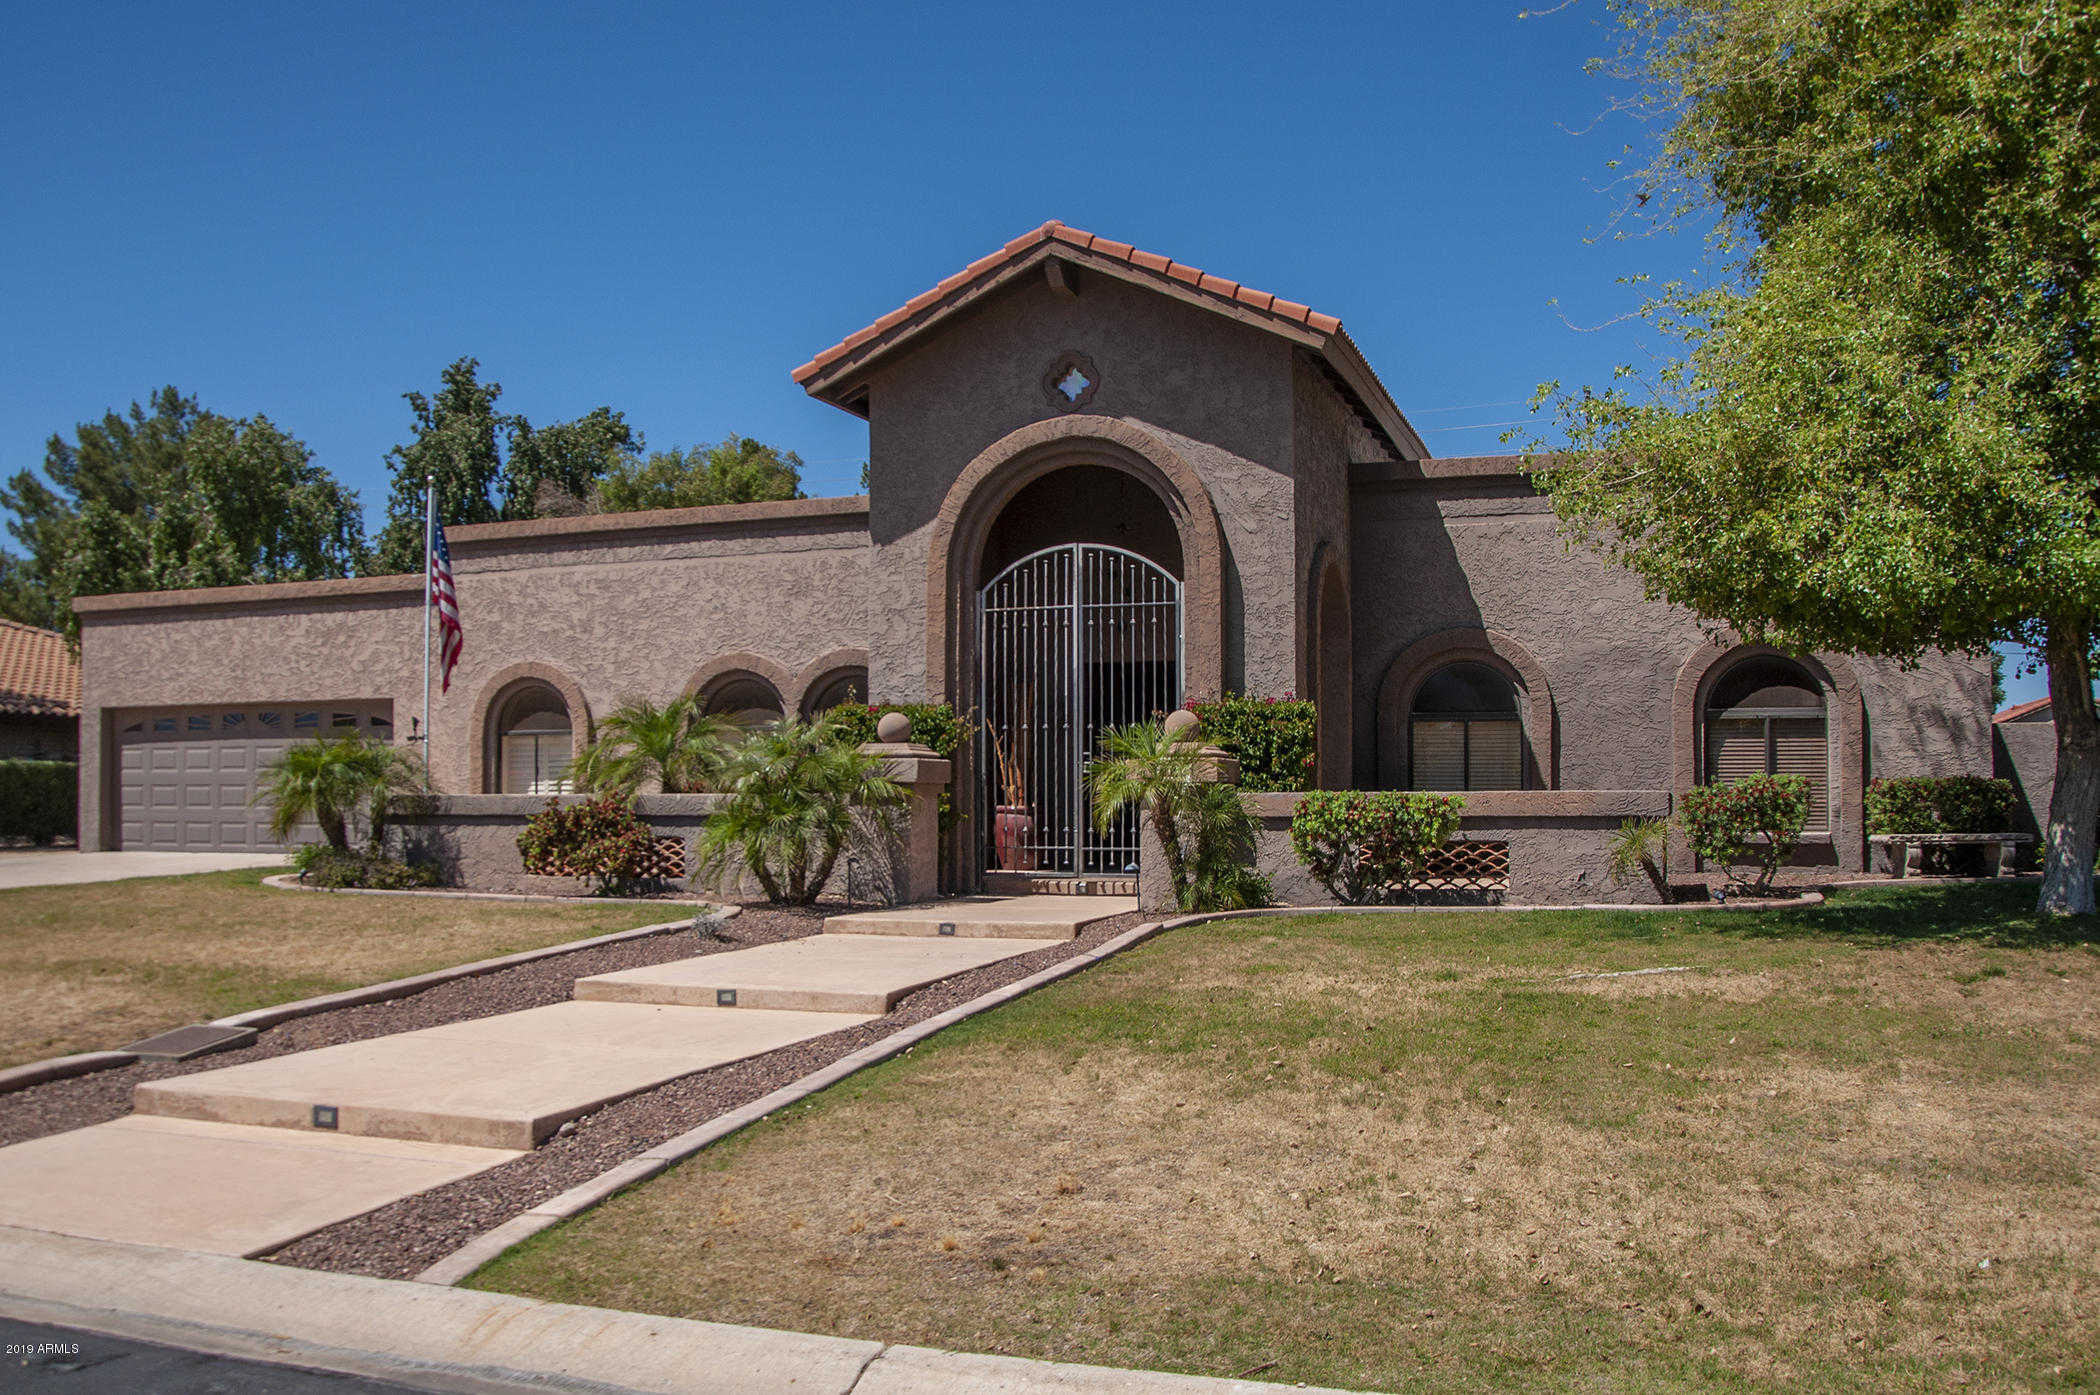 $444,900 - 4Br/3Ba - Home for Sale in Hidden Manor 3 Lot 111-157, Glendale